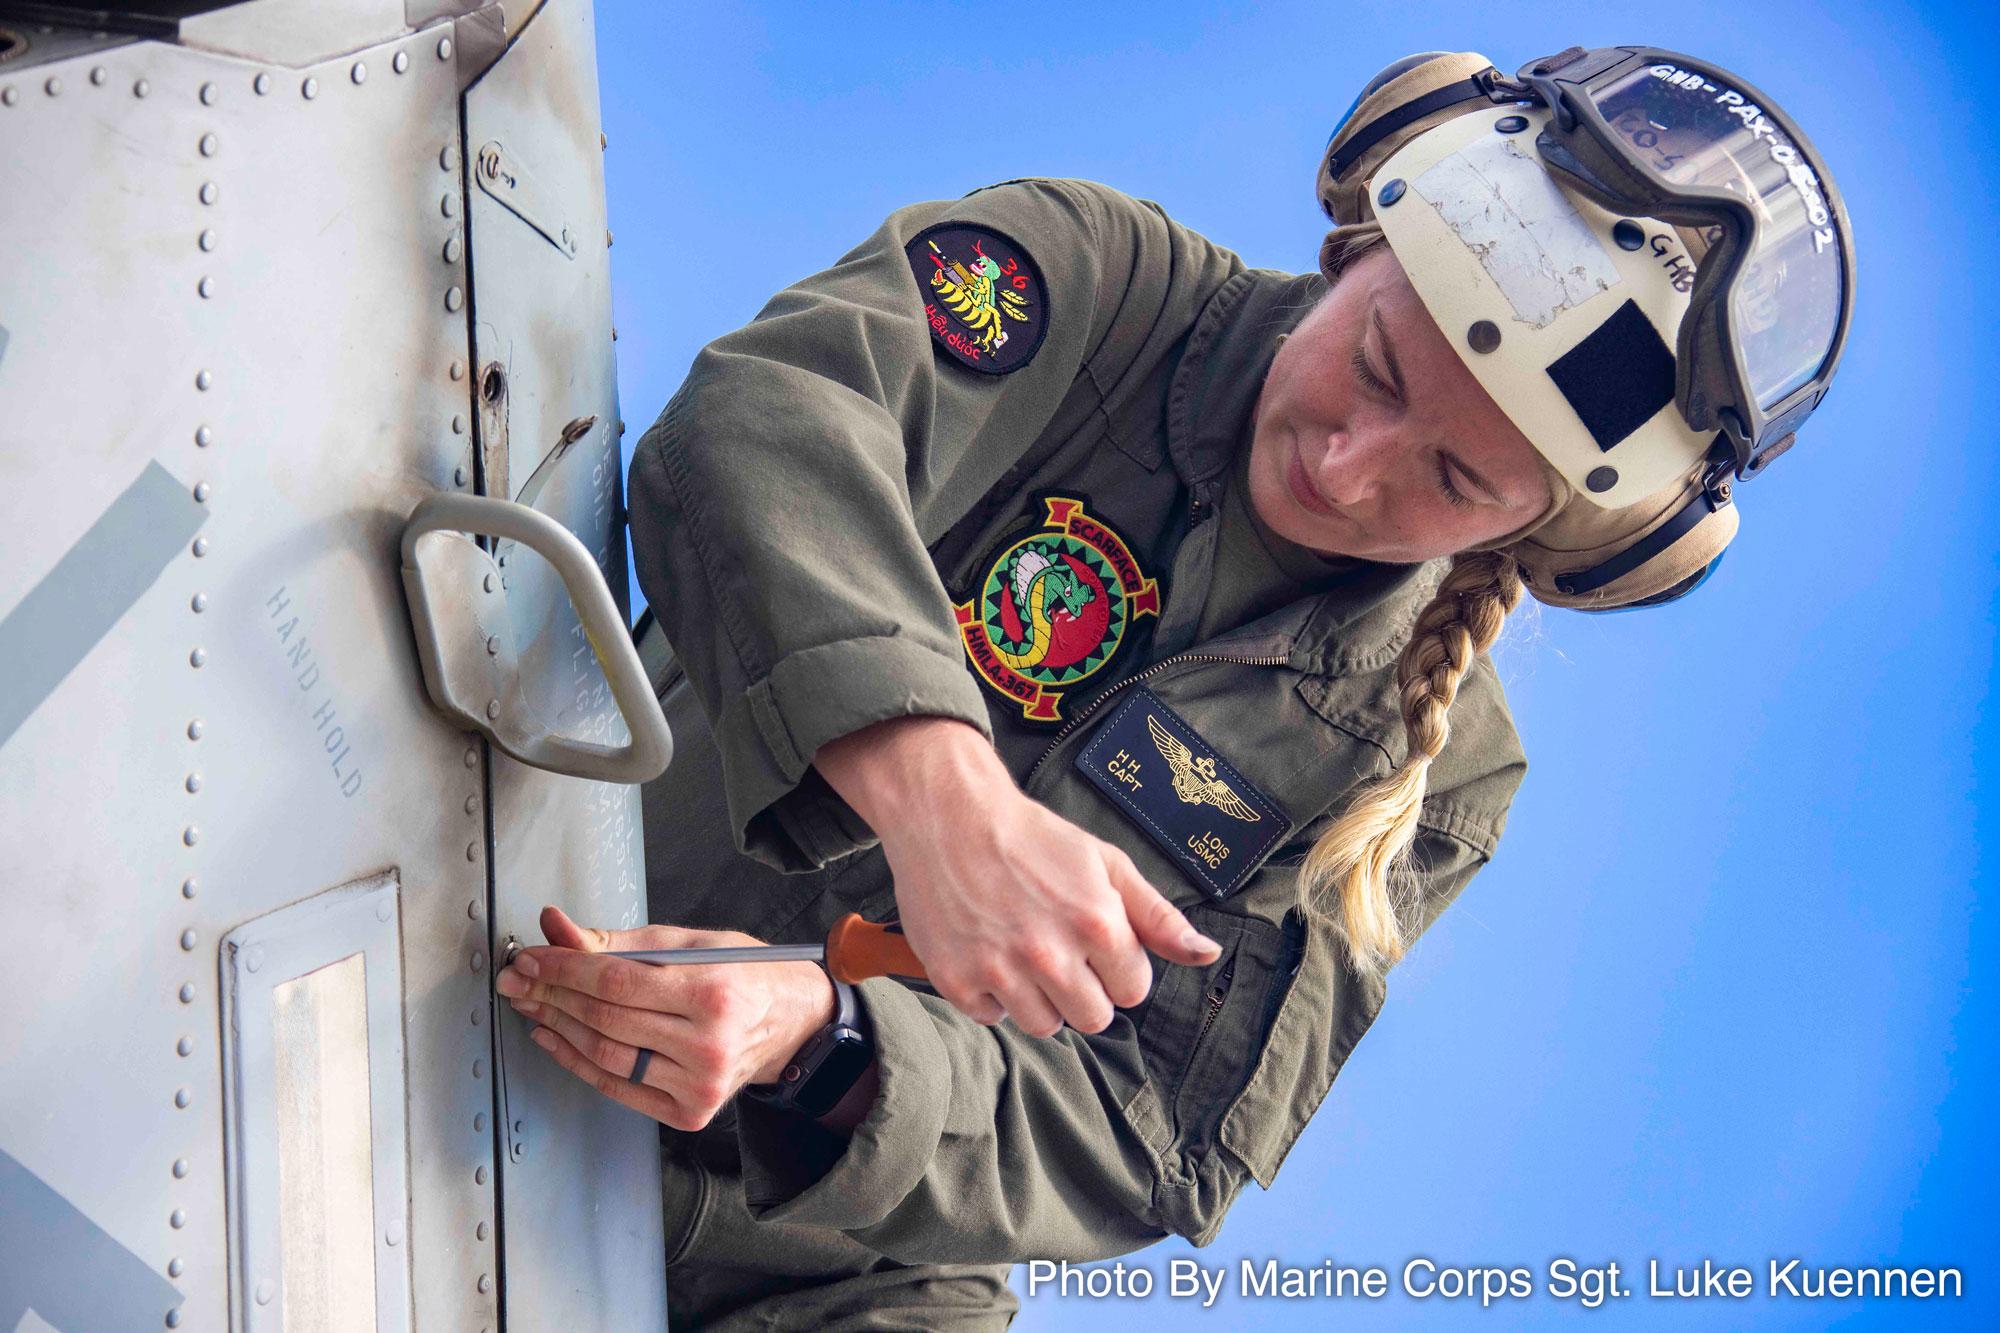 11-Photo-By-Marine-Corps-Sgt.-Luke-Kuennen-2.jpg